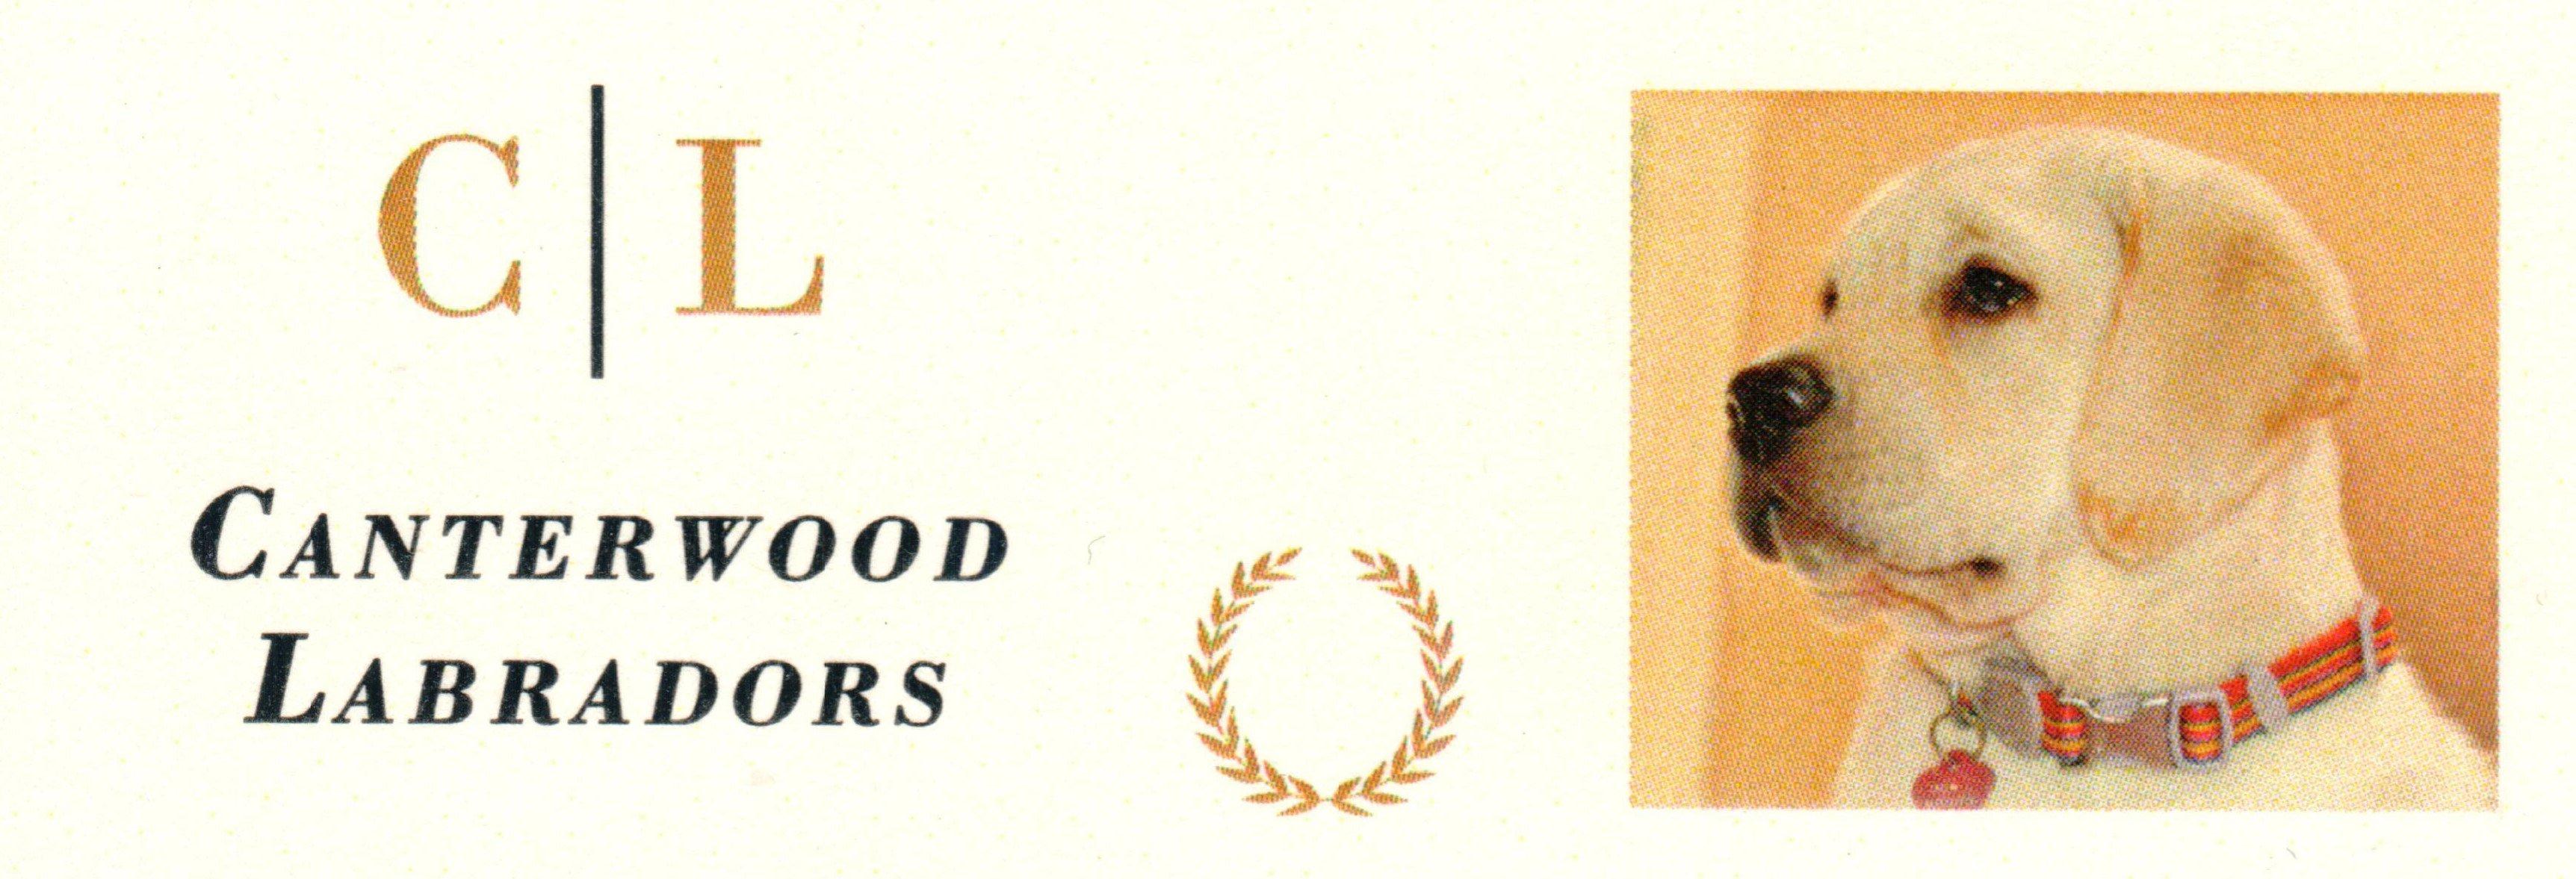 Canterwood Labradors